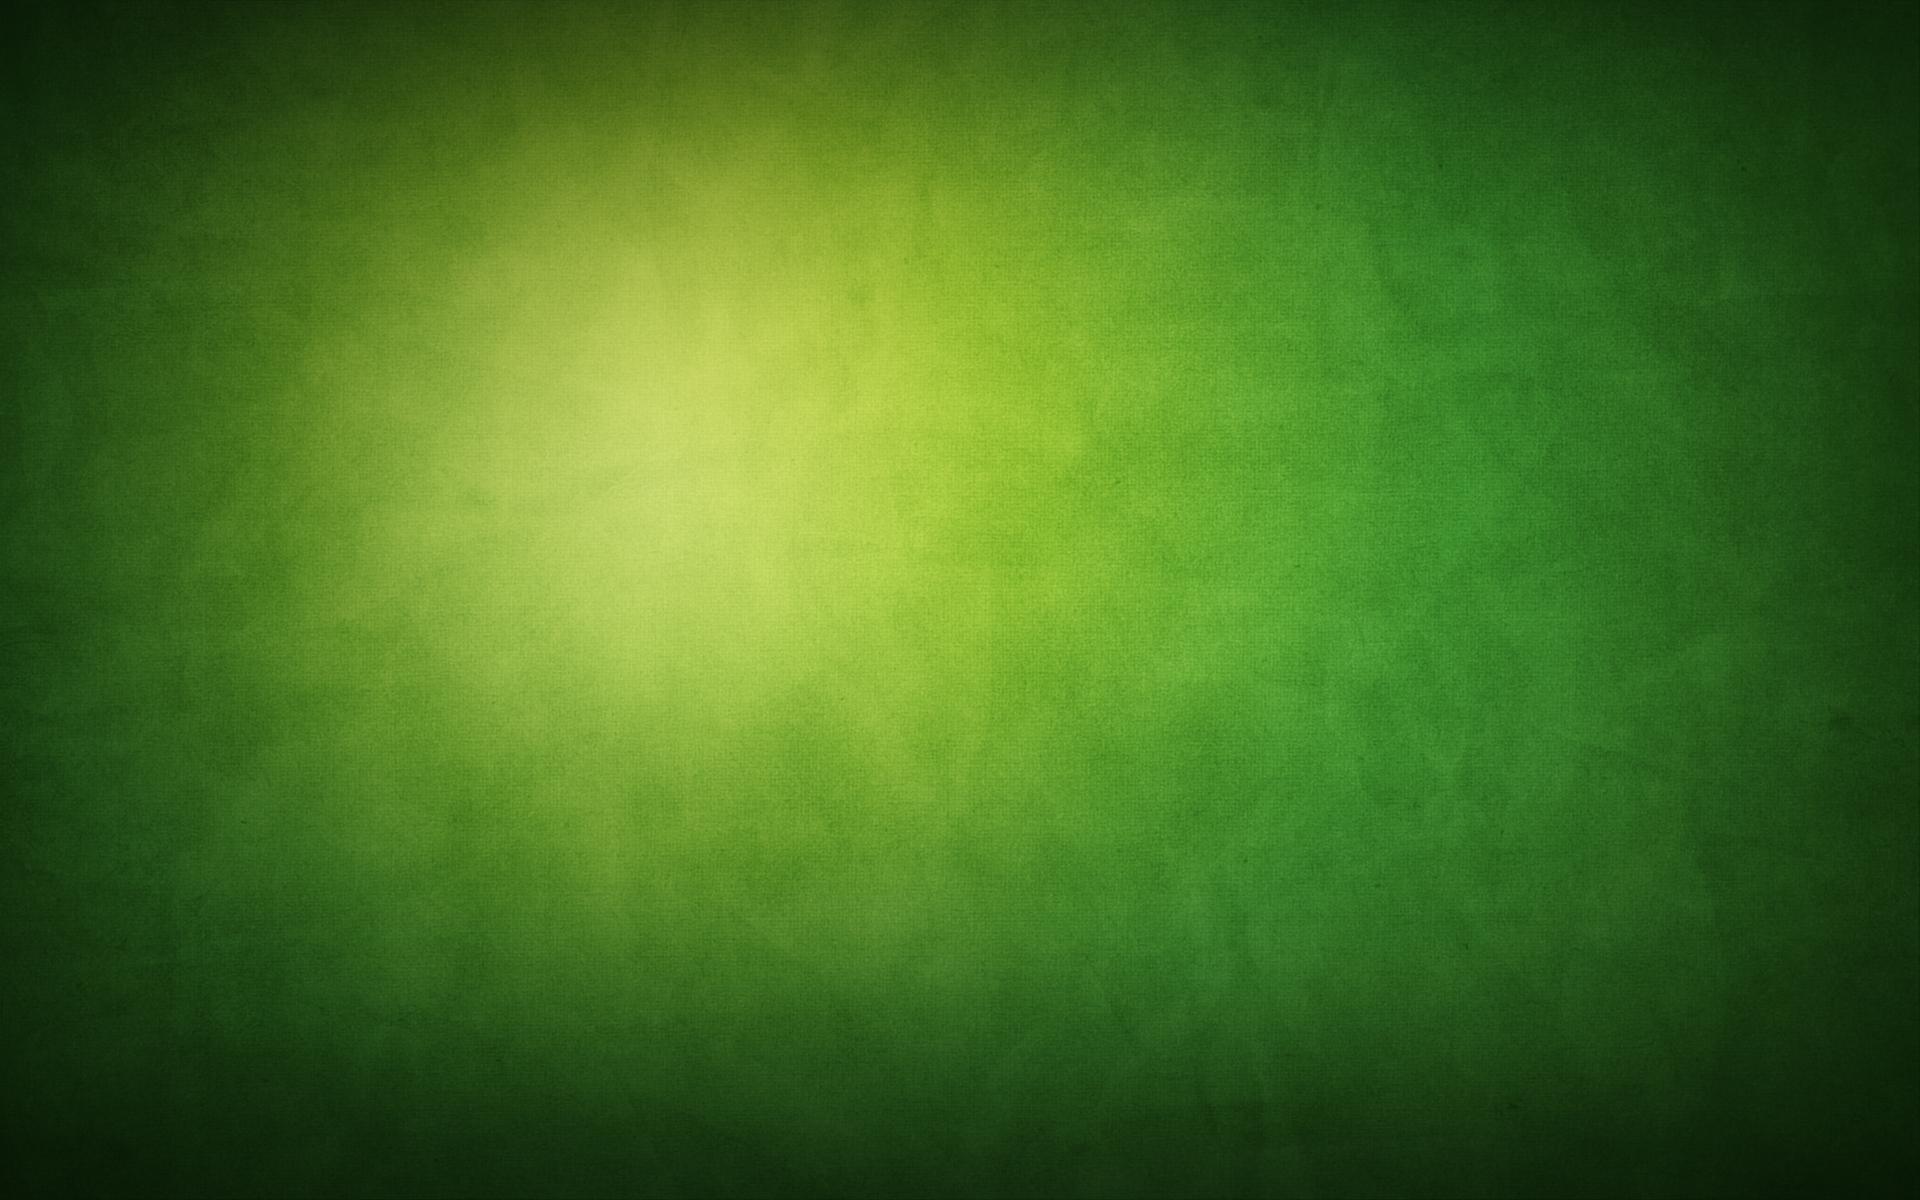 Green Background 1920x1200